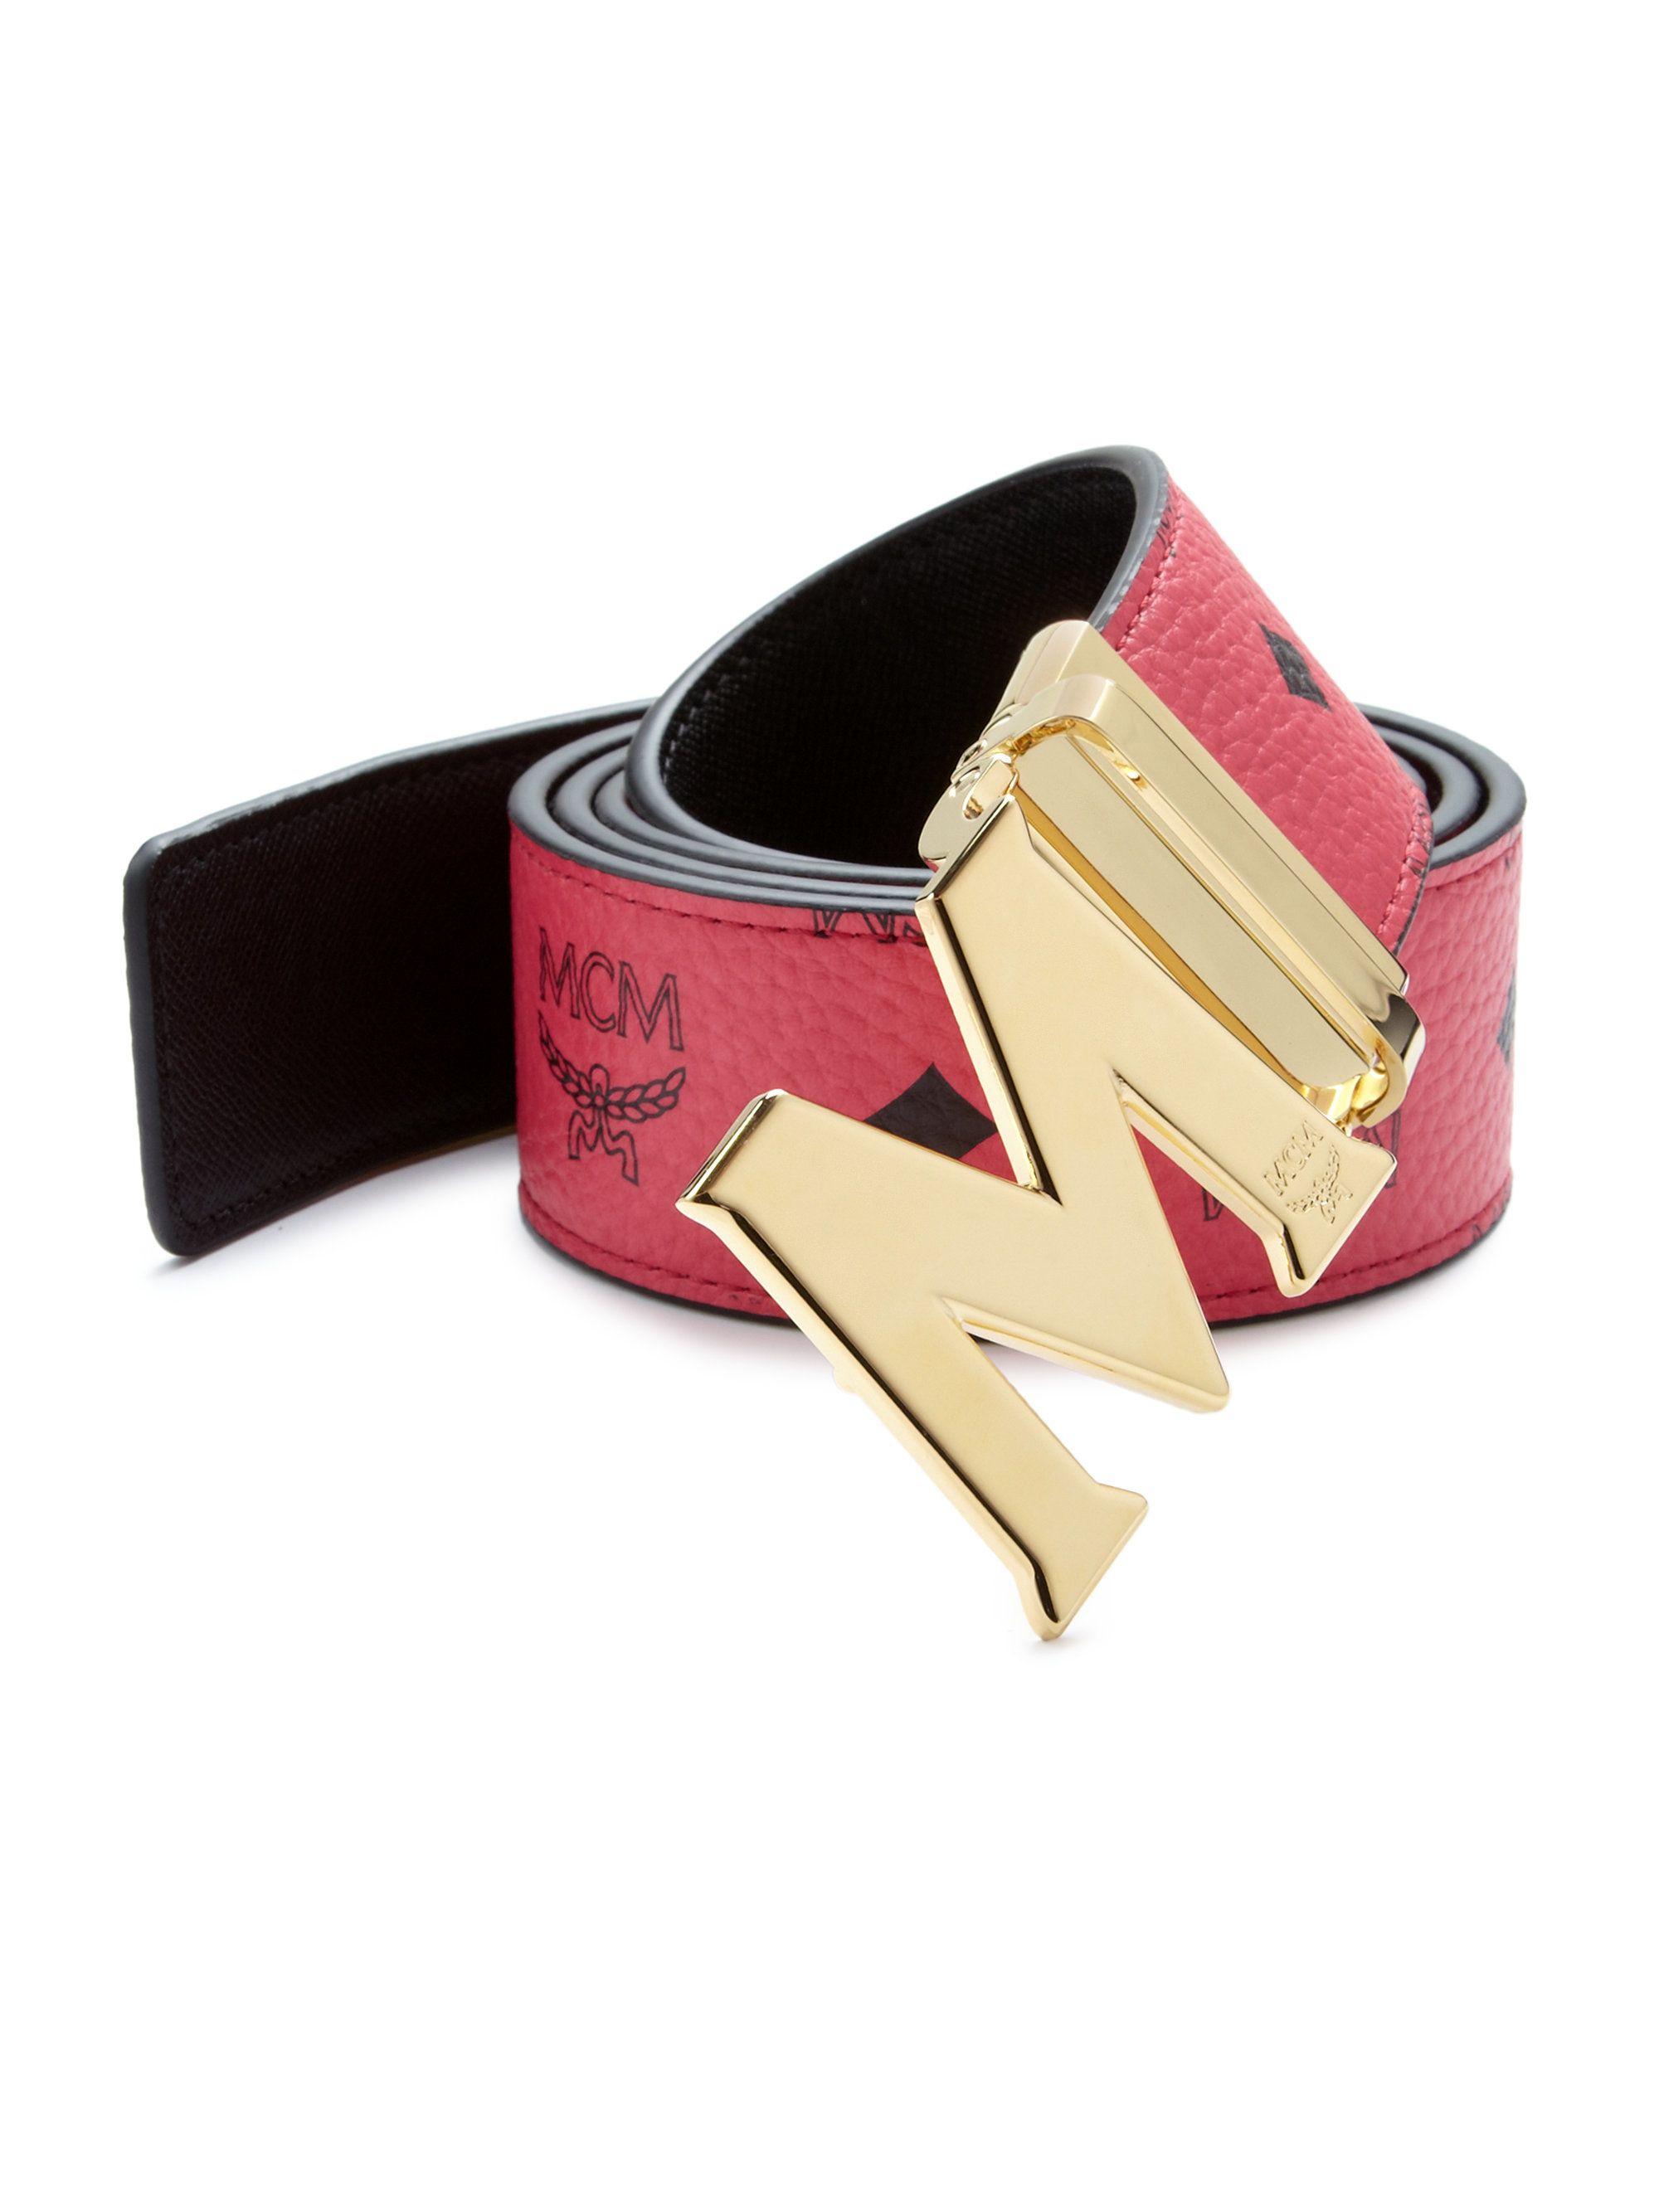 puma pointe belt virtual library of belts ferrari collections sandi